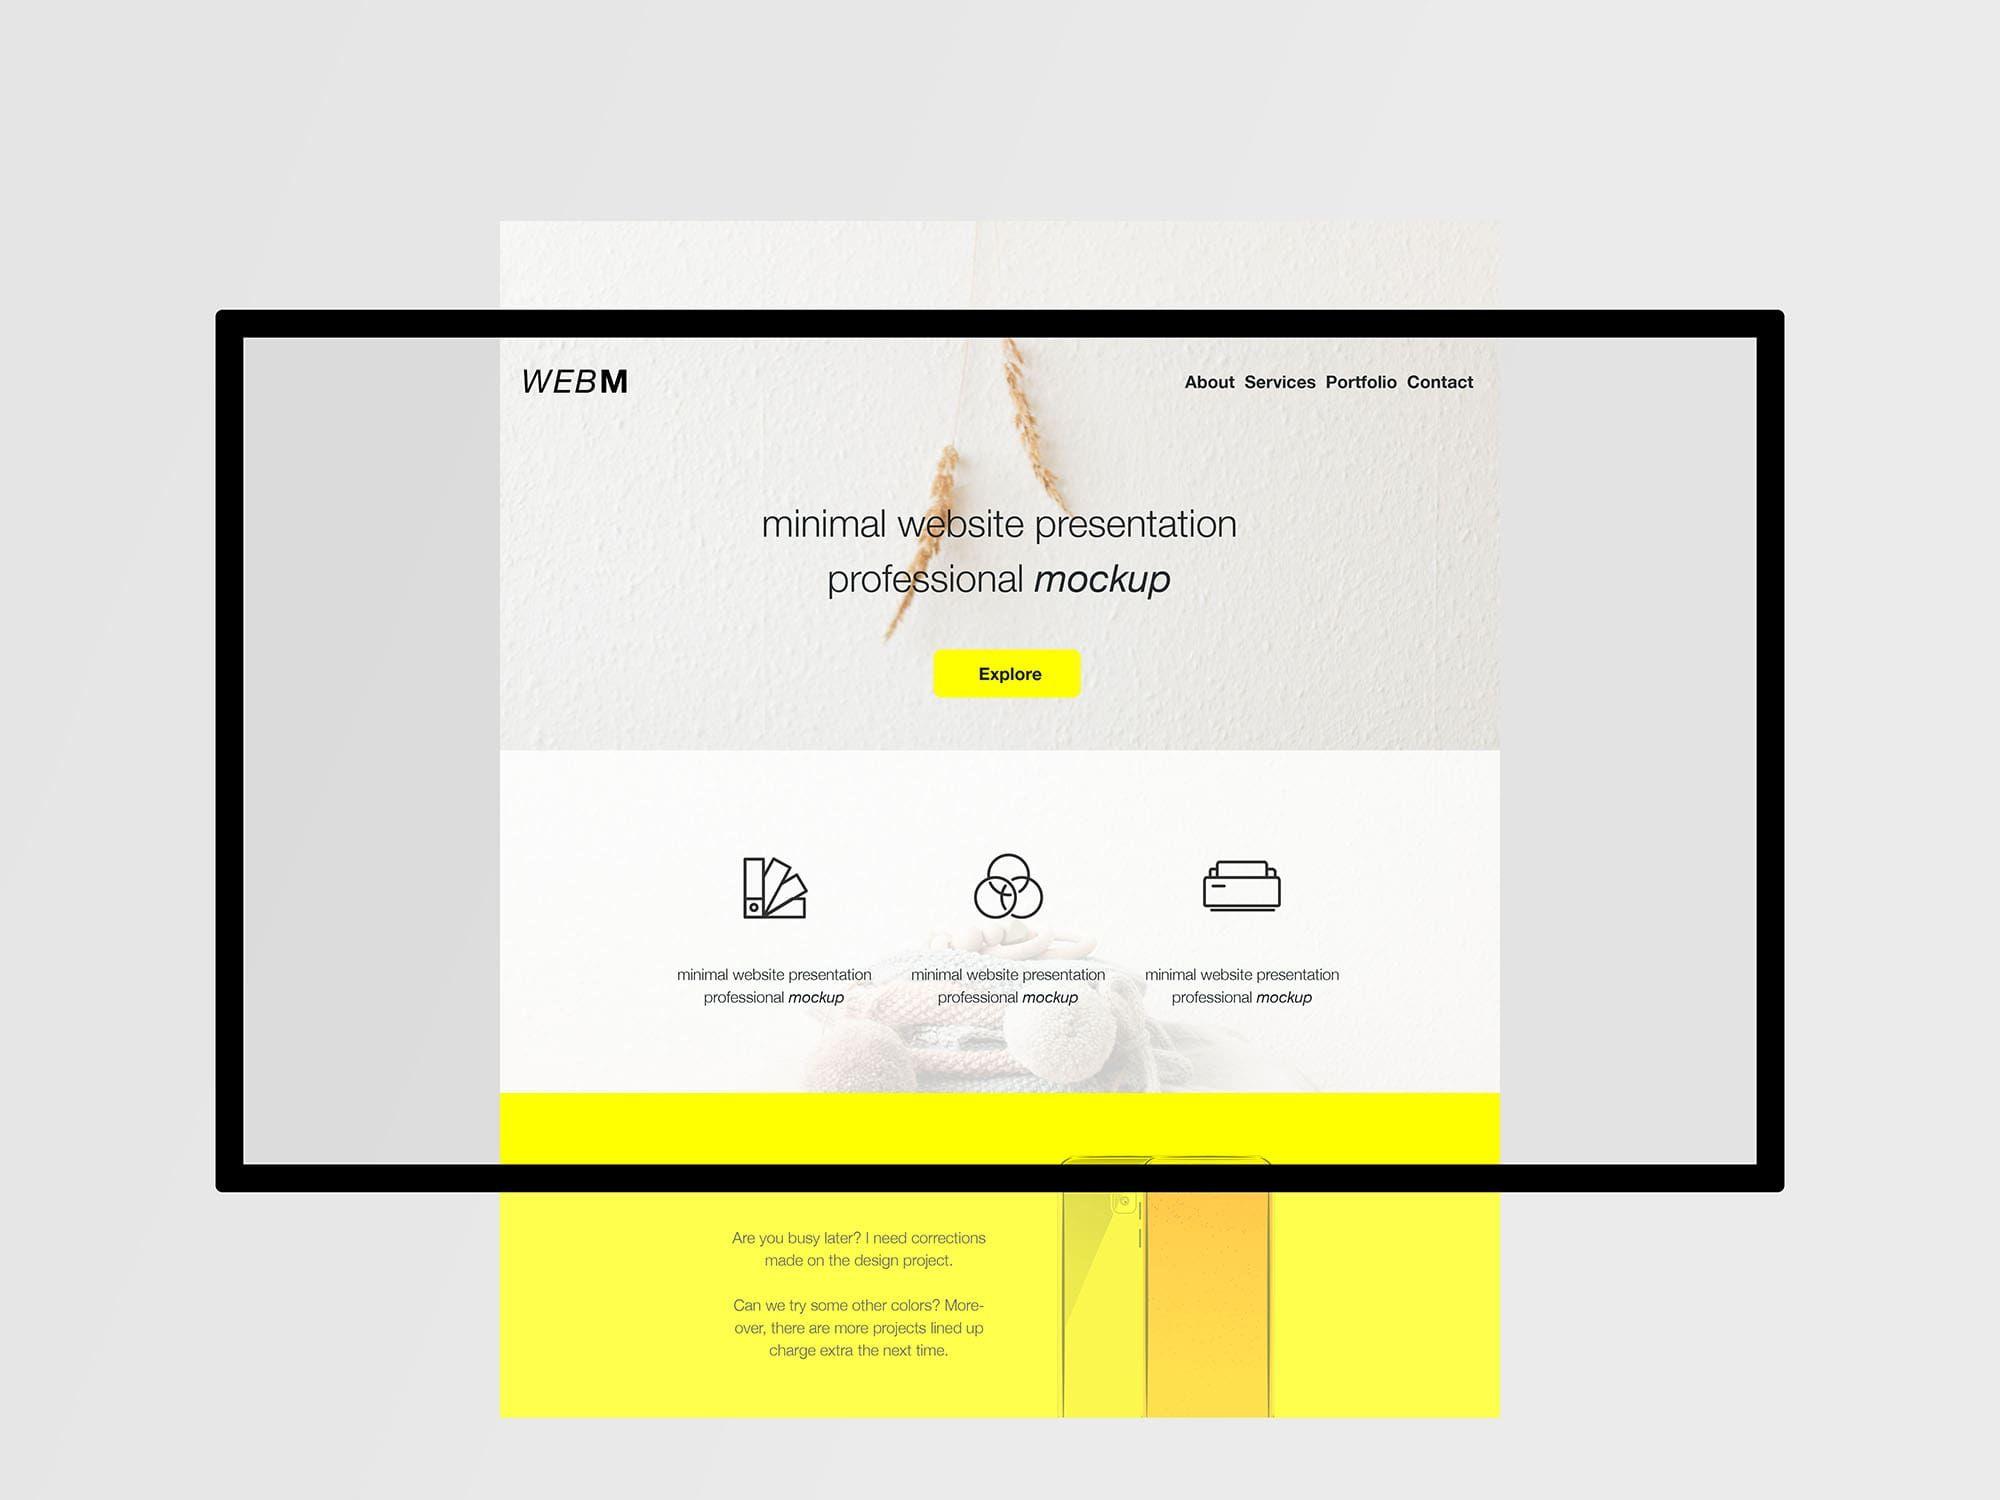 Free Minimal Flat Website Presentation Mockup Website Mockup Website Mockup Free Website Mockup Psd